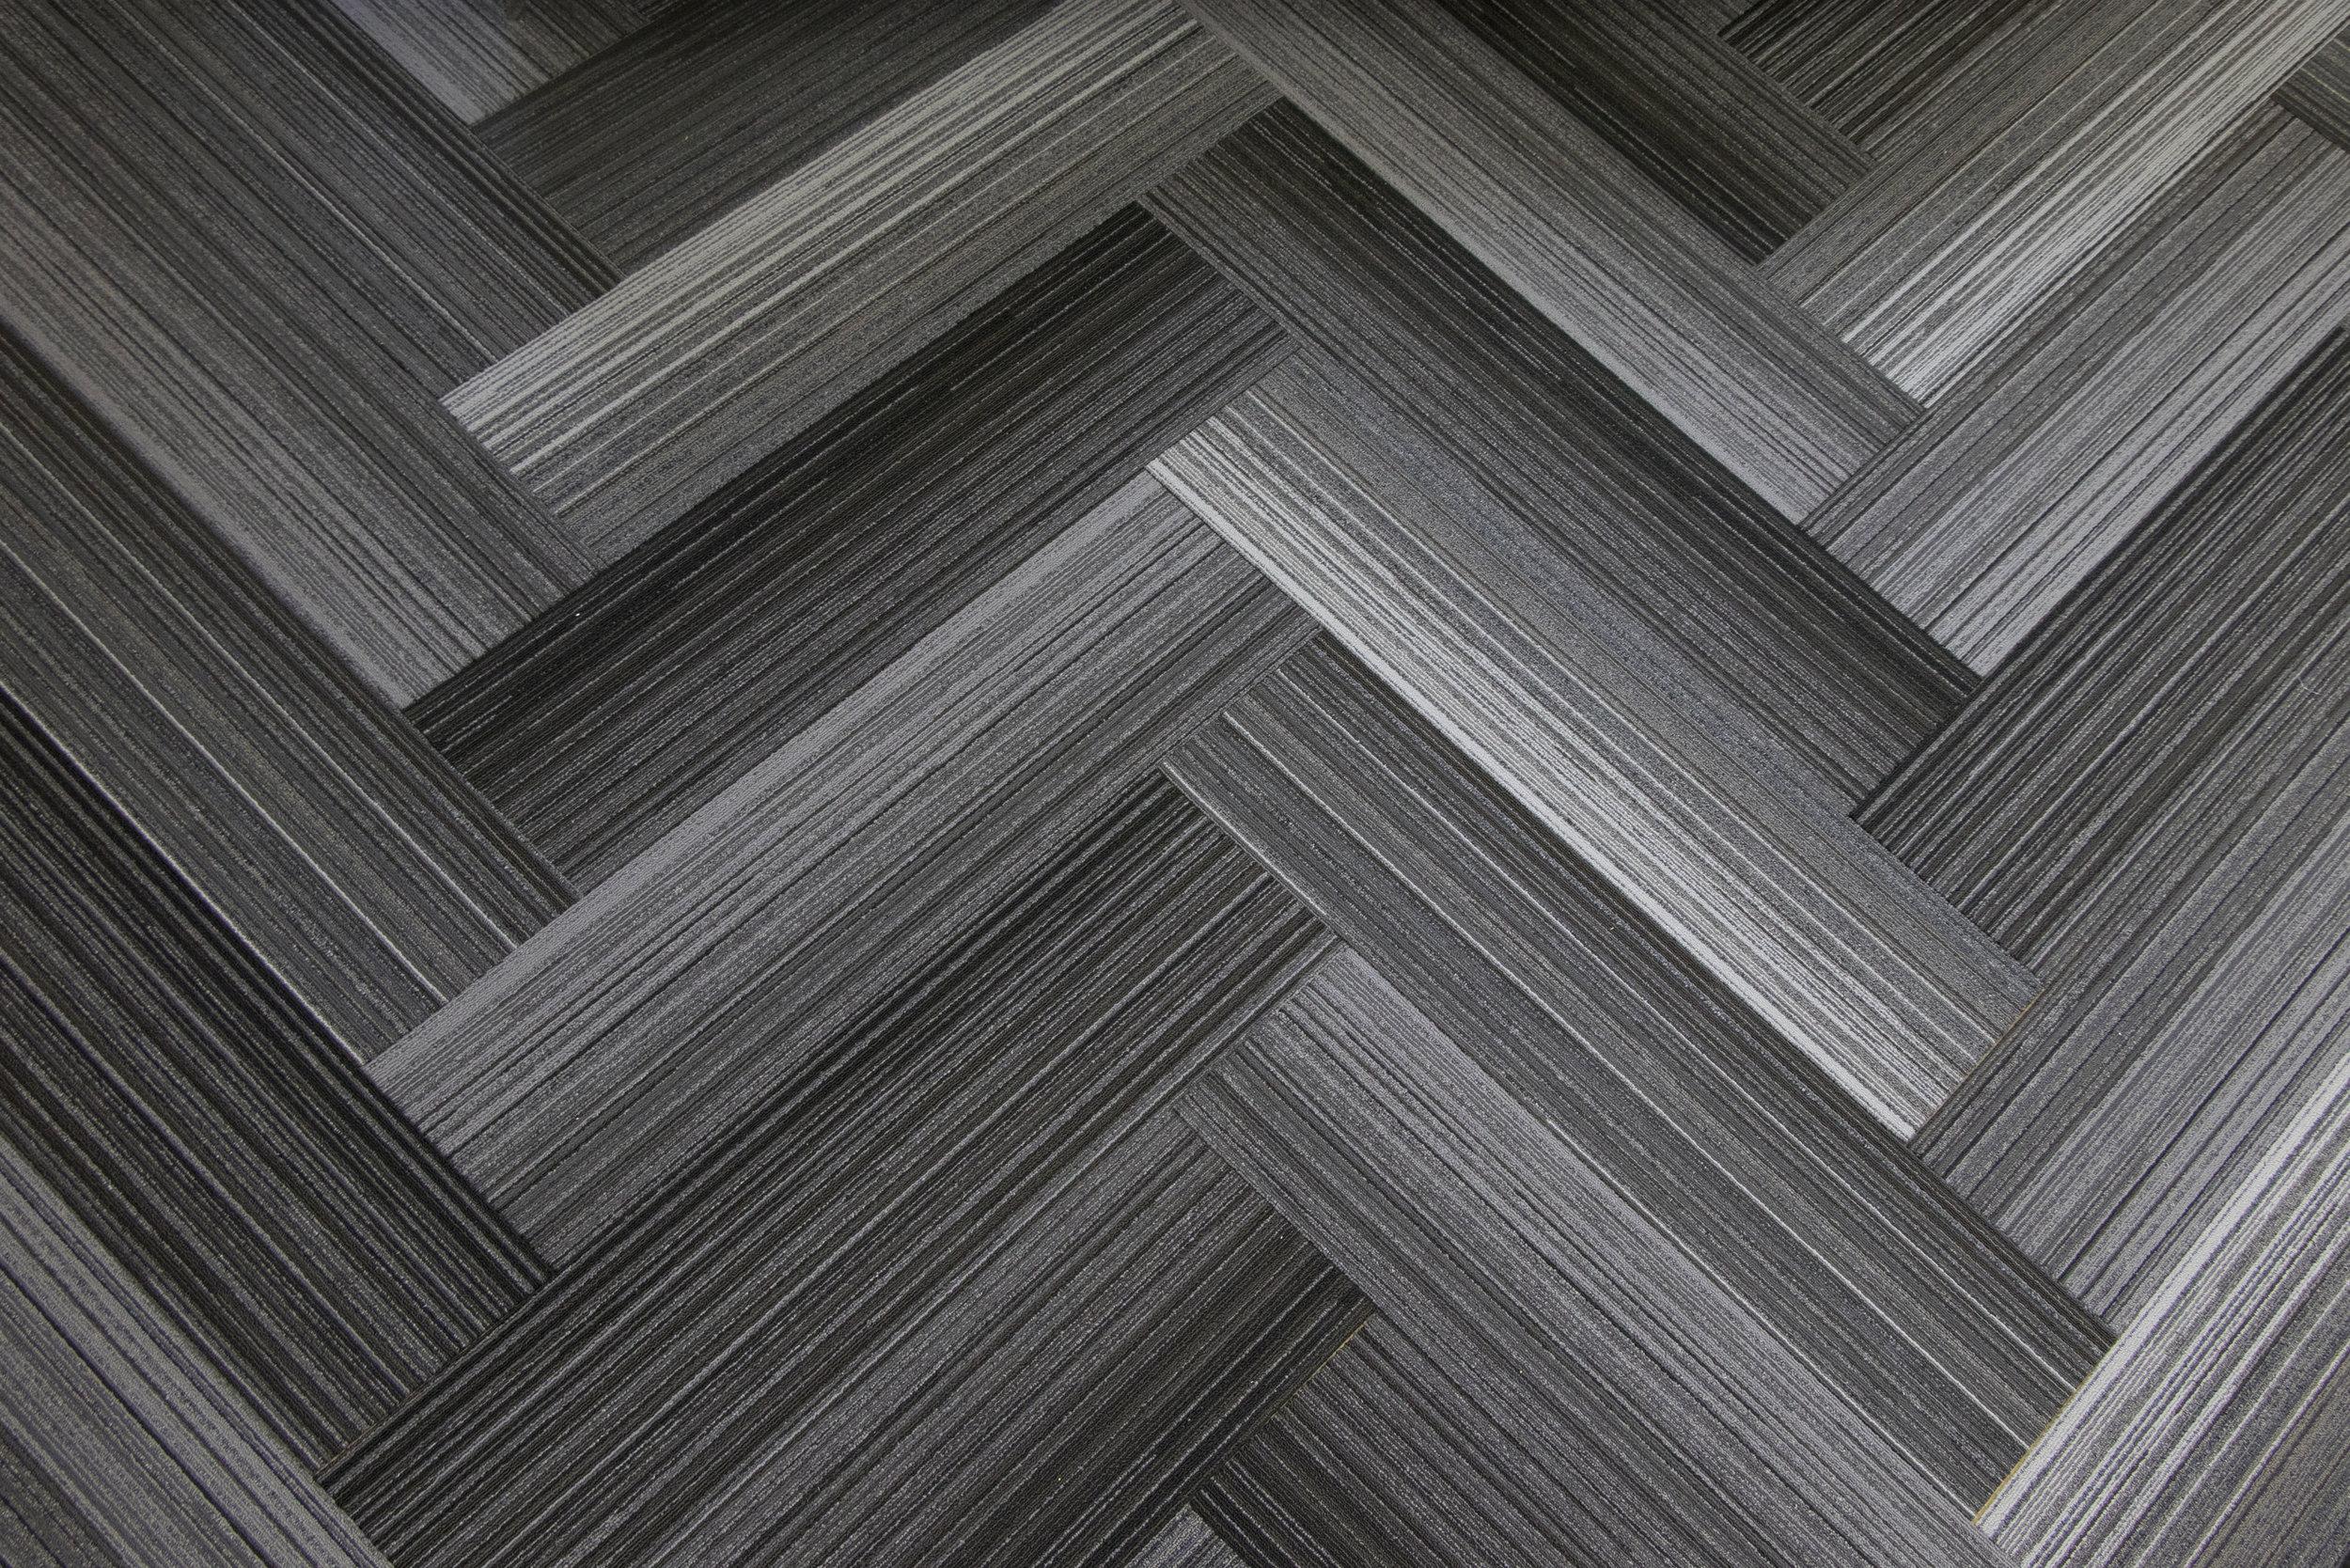 Venture-Carpets-Stratton-herringbone.jpg